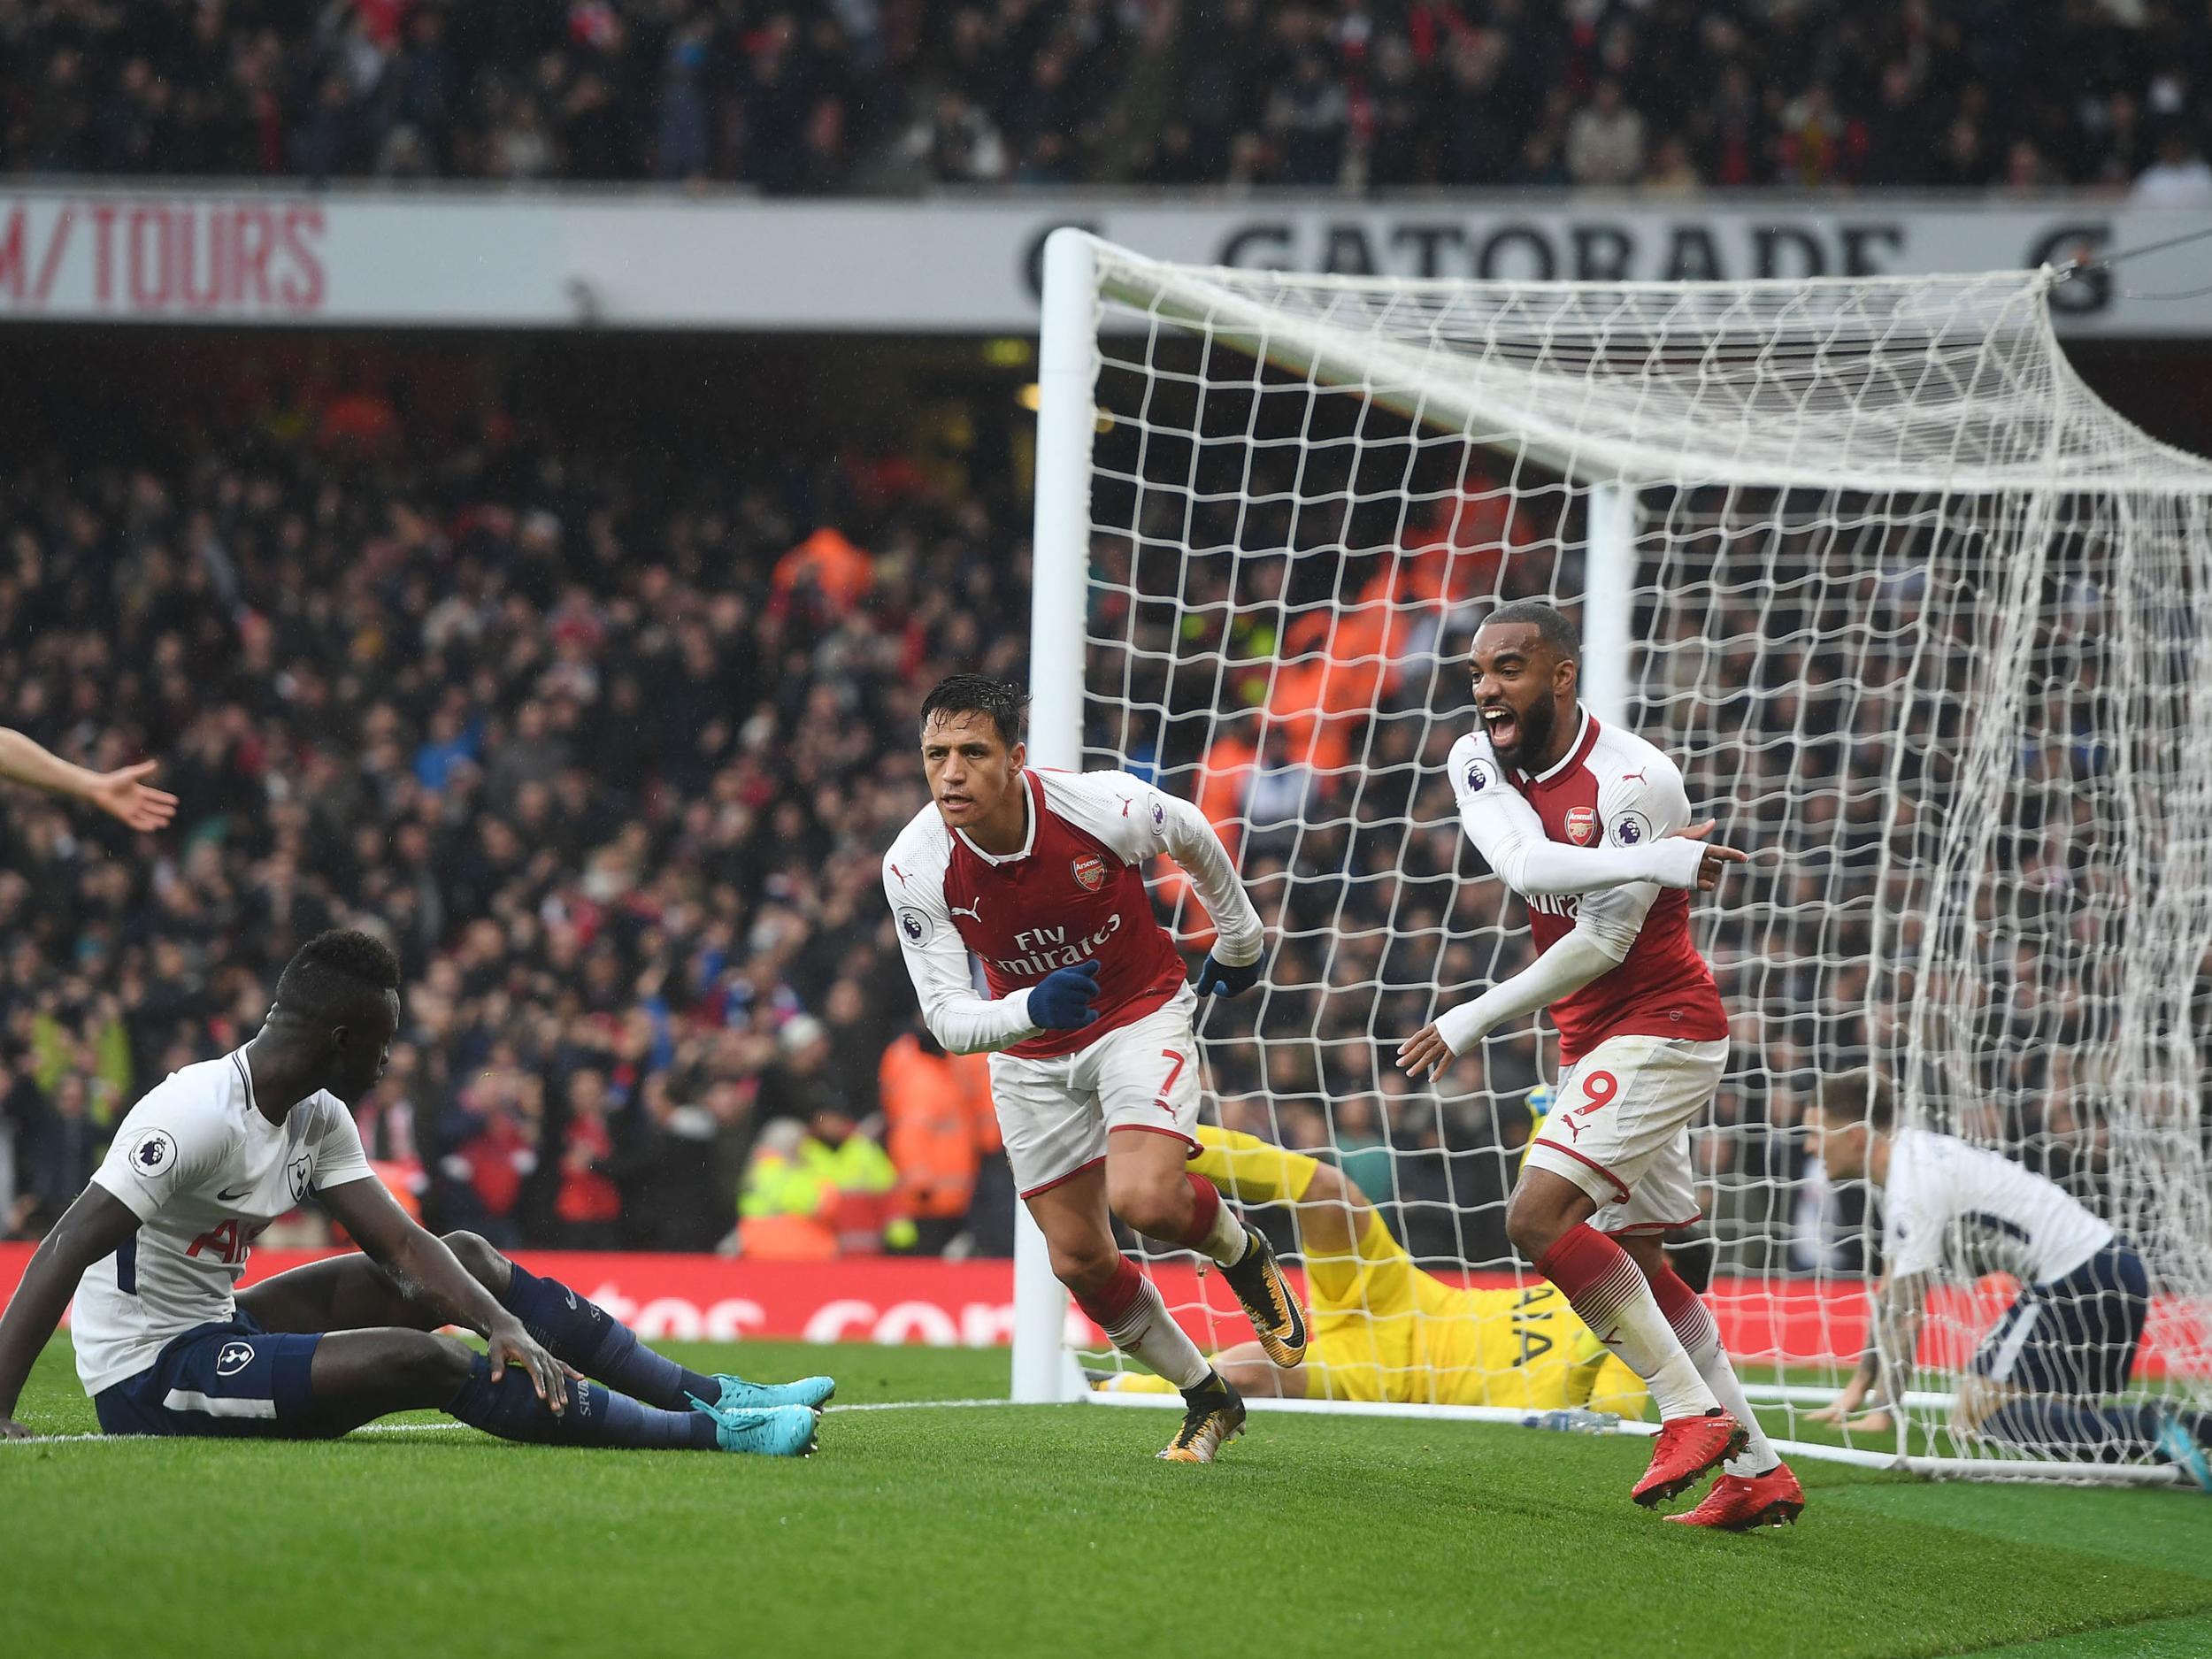 Arsenal are still a bigger club than Tottenham, claims Jamie Carragher